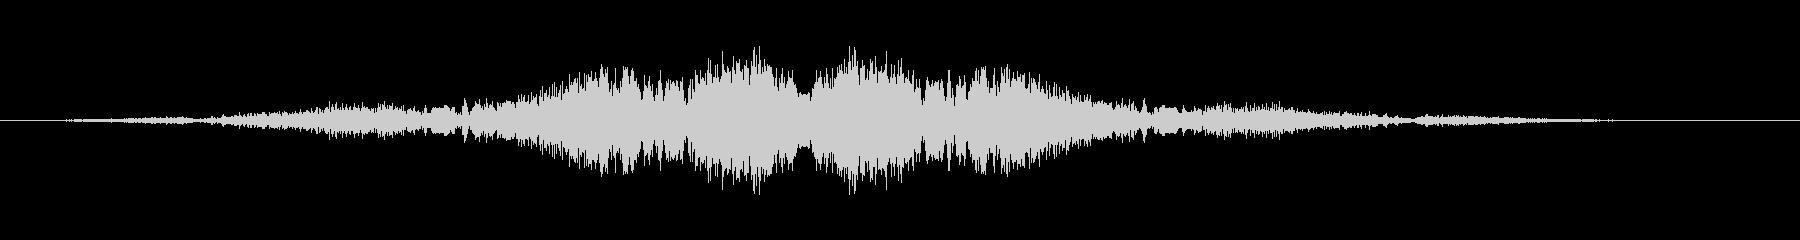 SWOOSH WAVE REWIND 1の未再生の波形